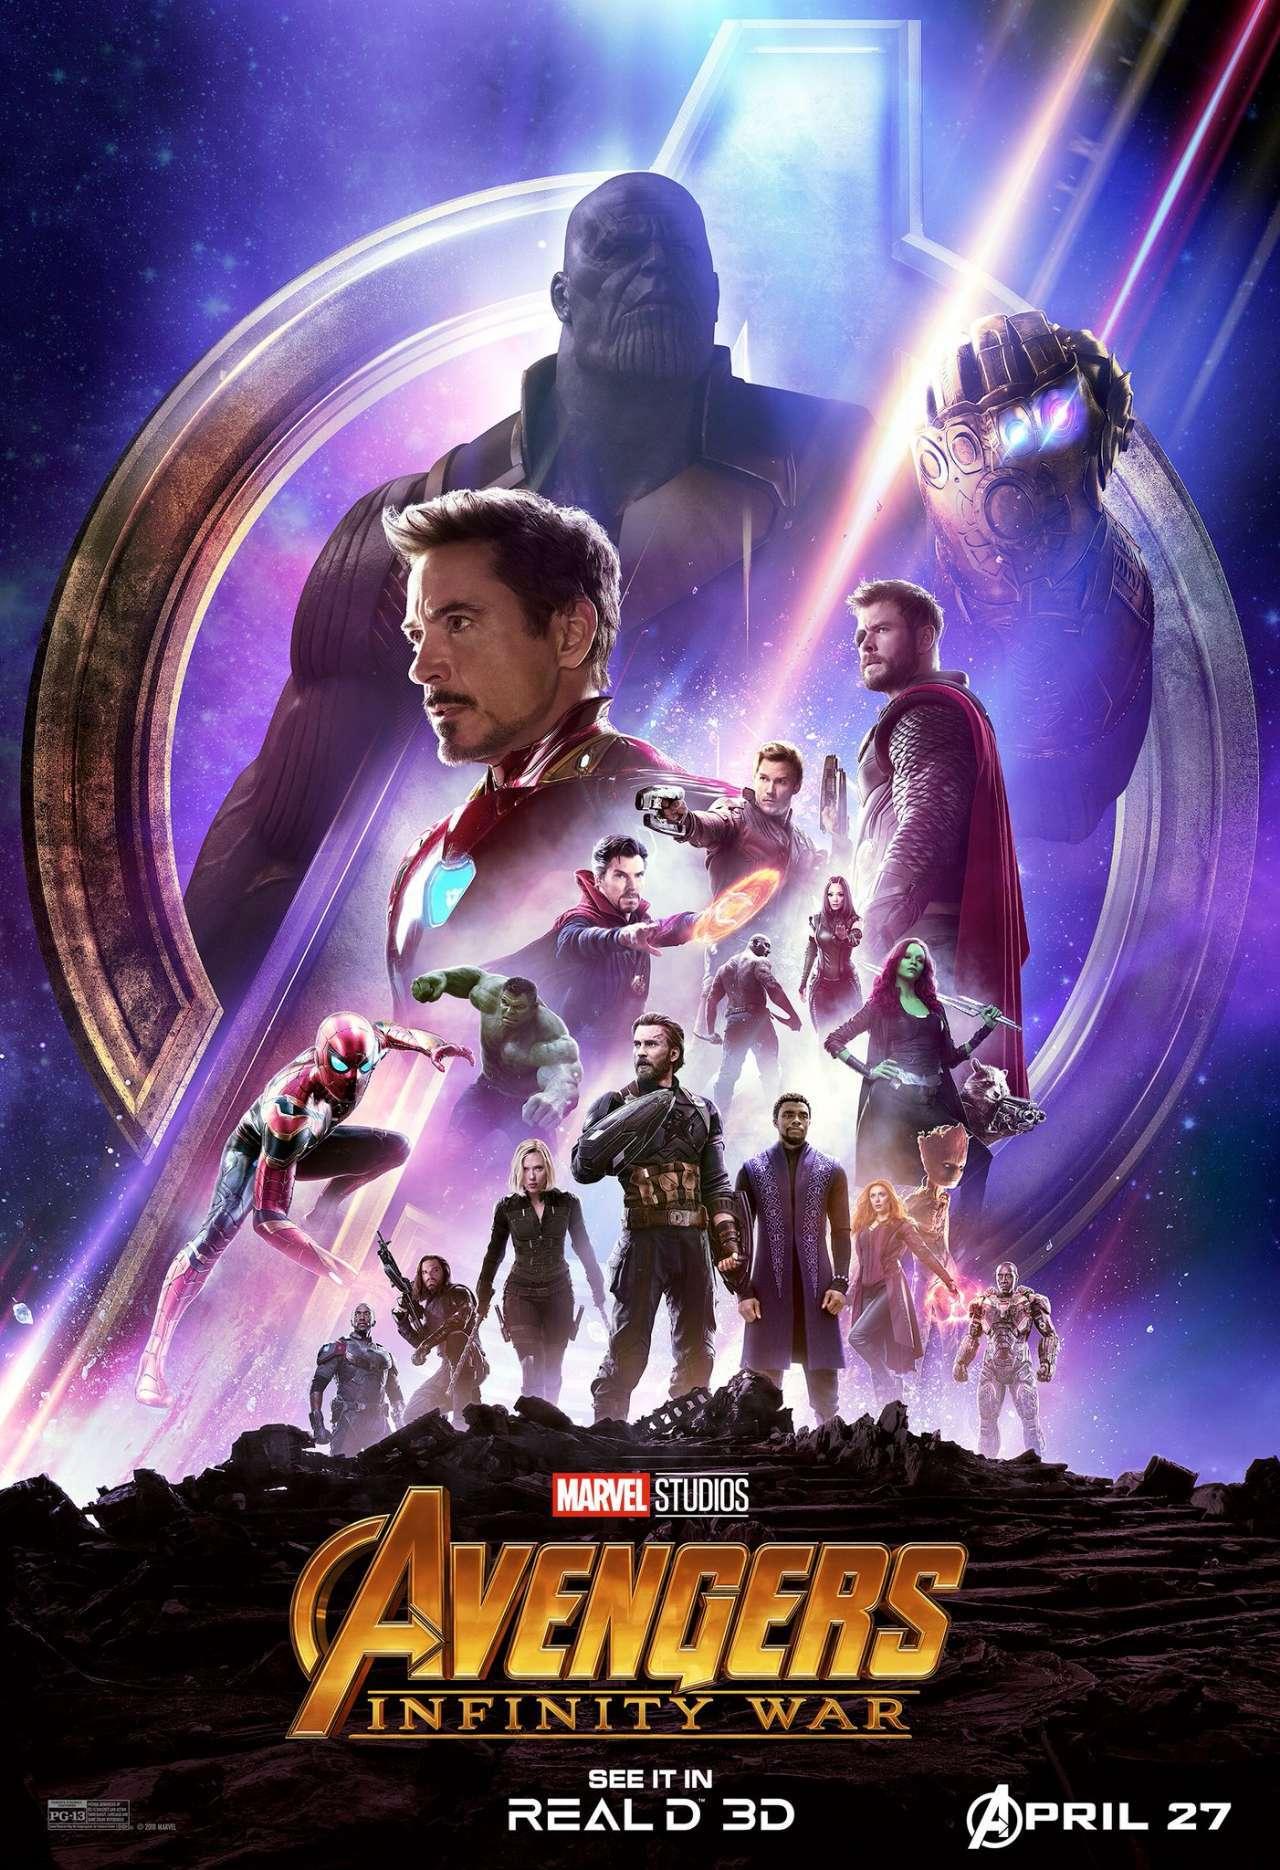 avengers-infinity-war-purple-poster-1101623